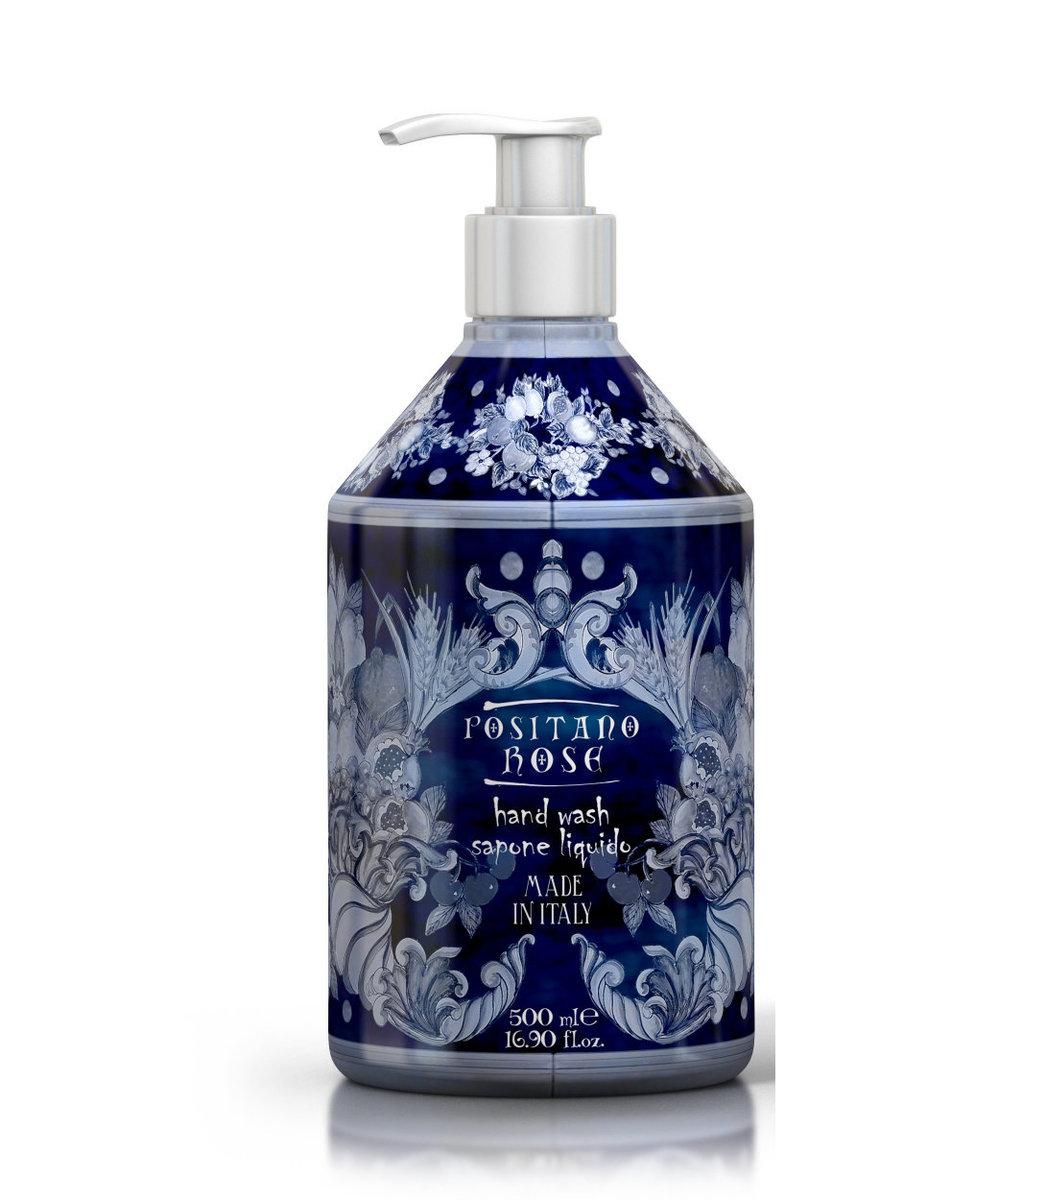 Positano Rose Luxury Hand Cream Soap